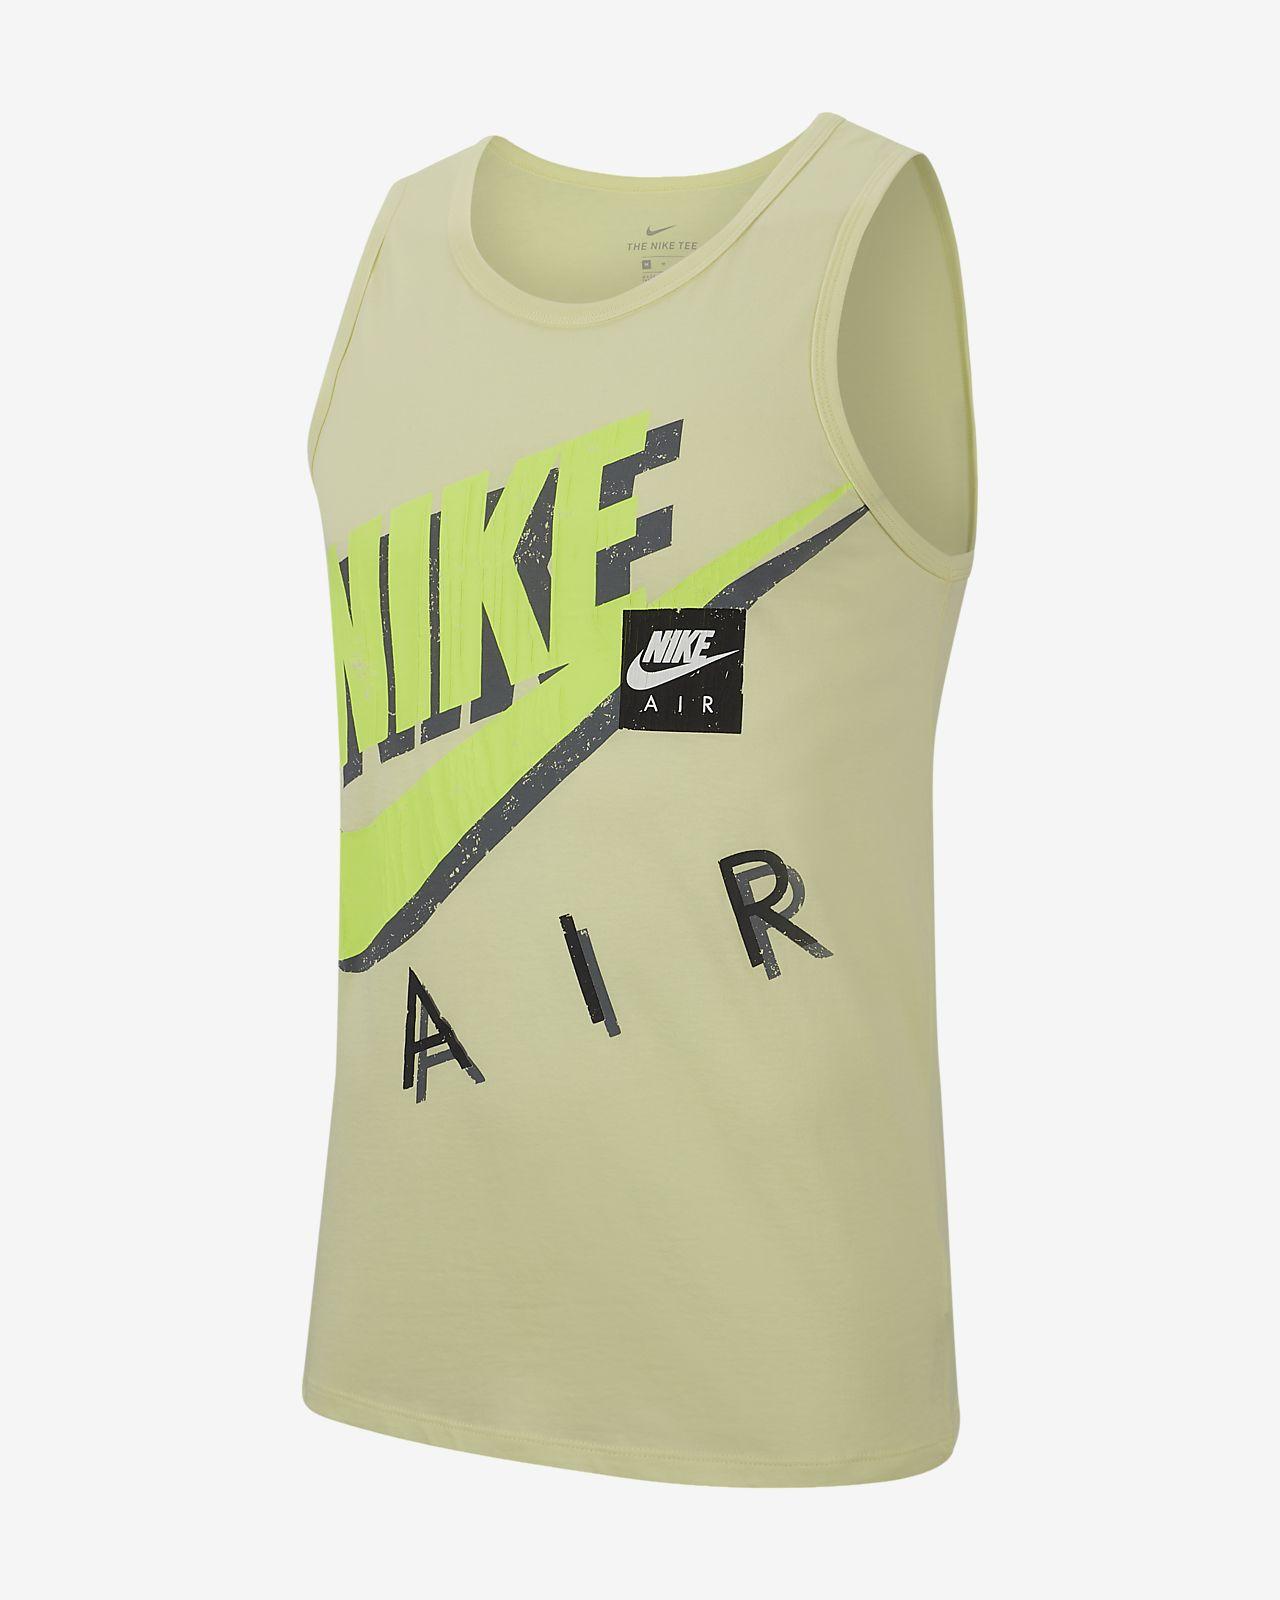 Canotta Nike Sportswear - Uomo